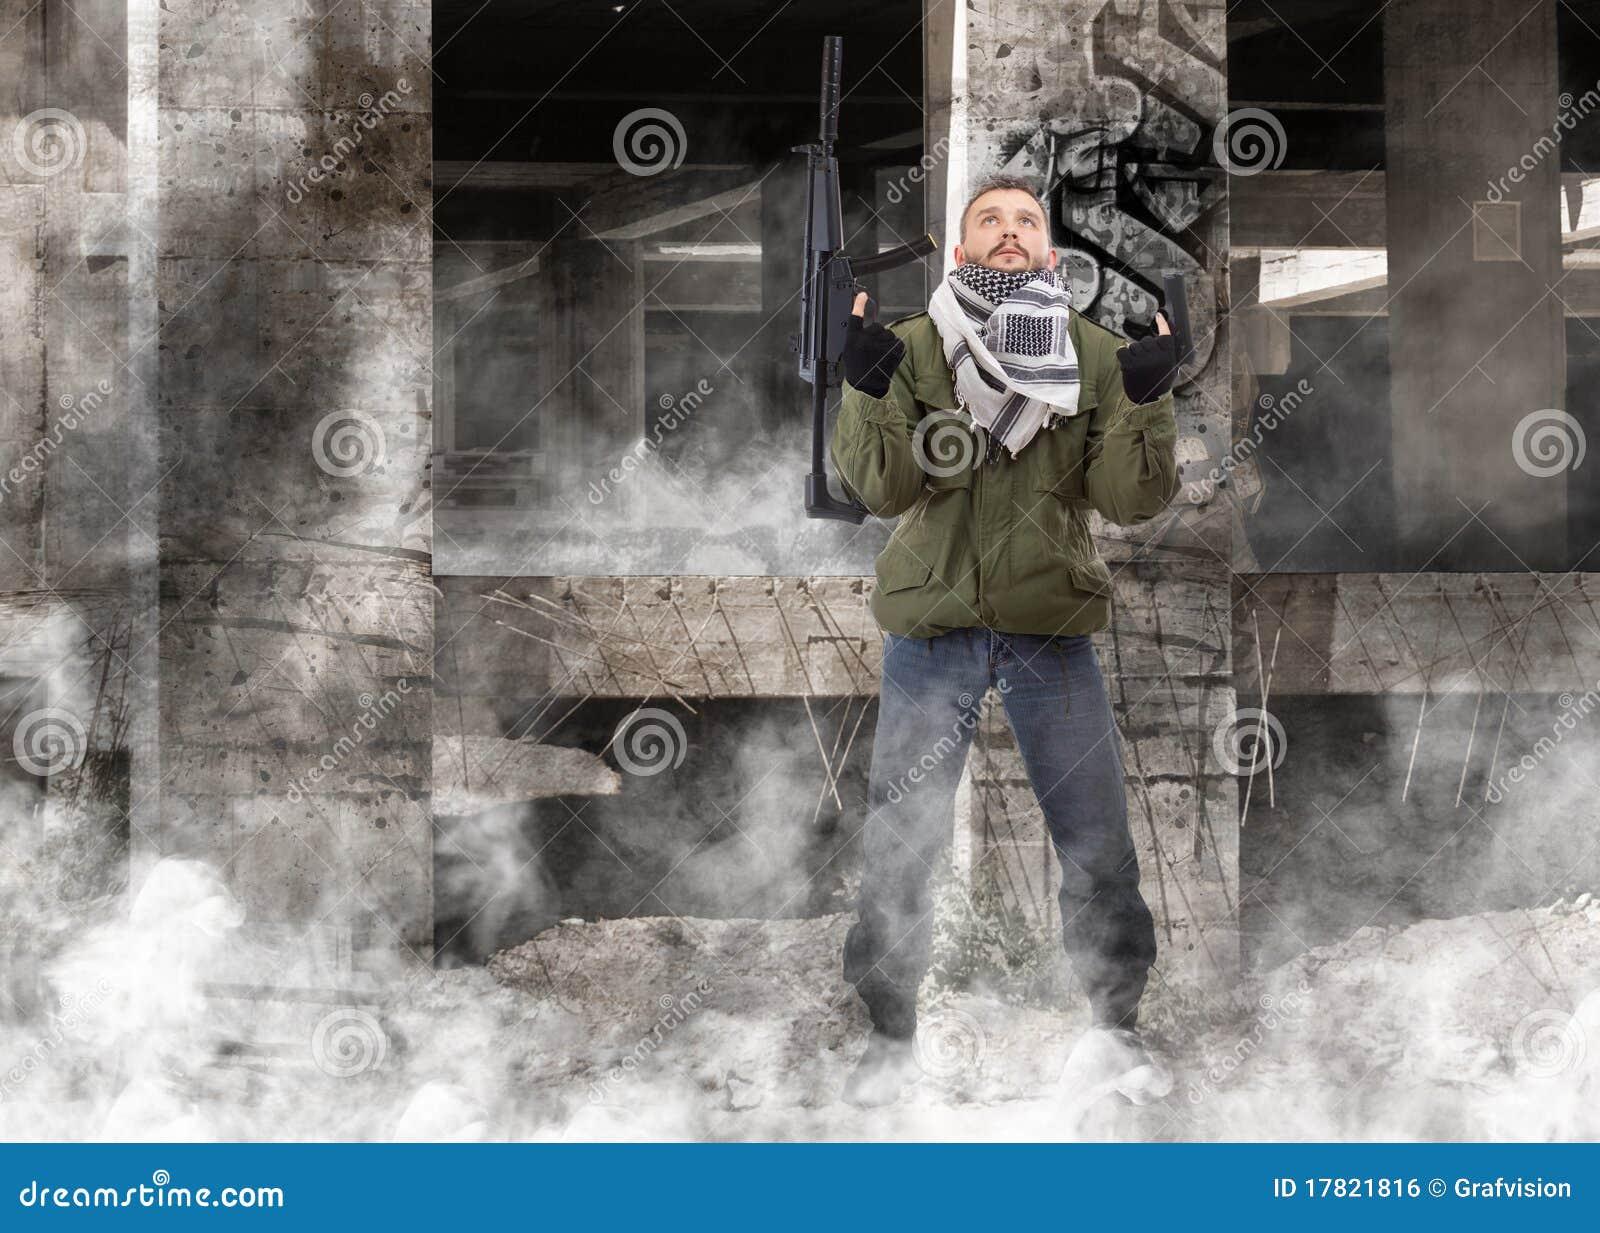 Karabinowy terrorysta